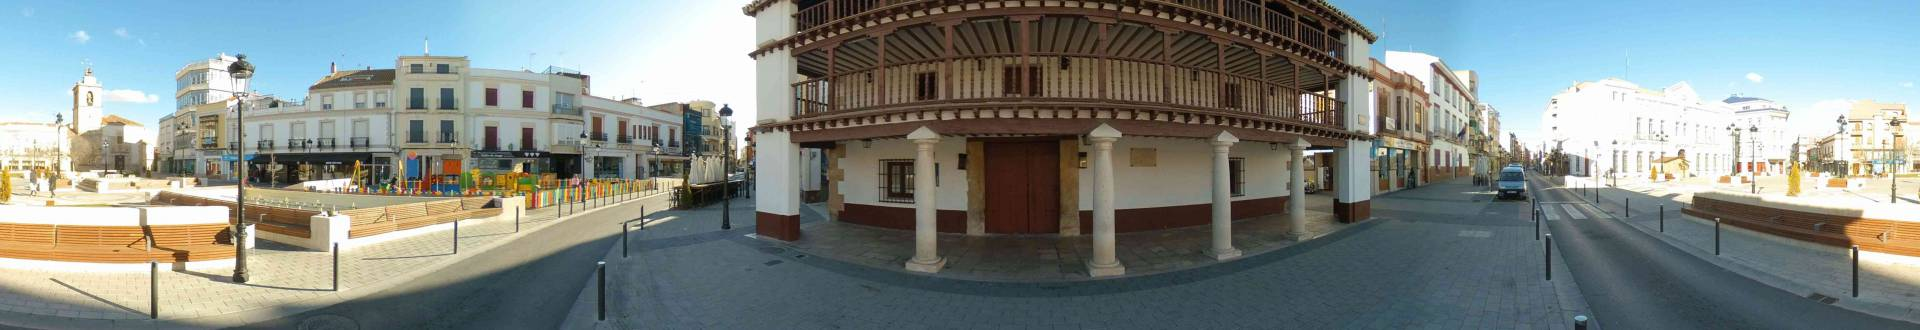 Girada360 | Tomelloso Spain | 360 3D VR tours